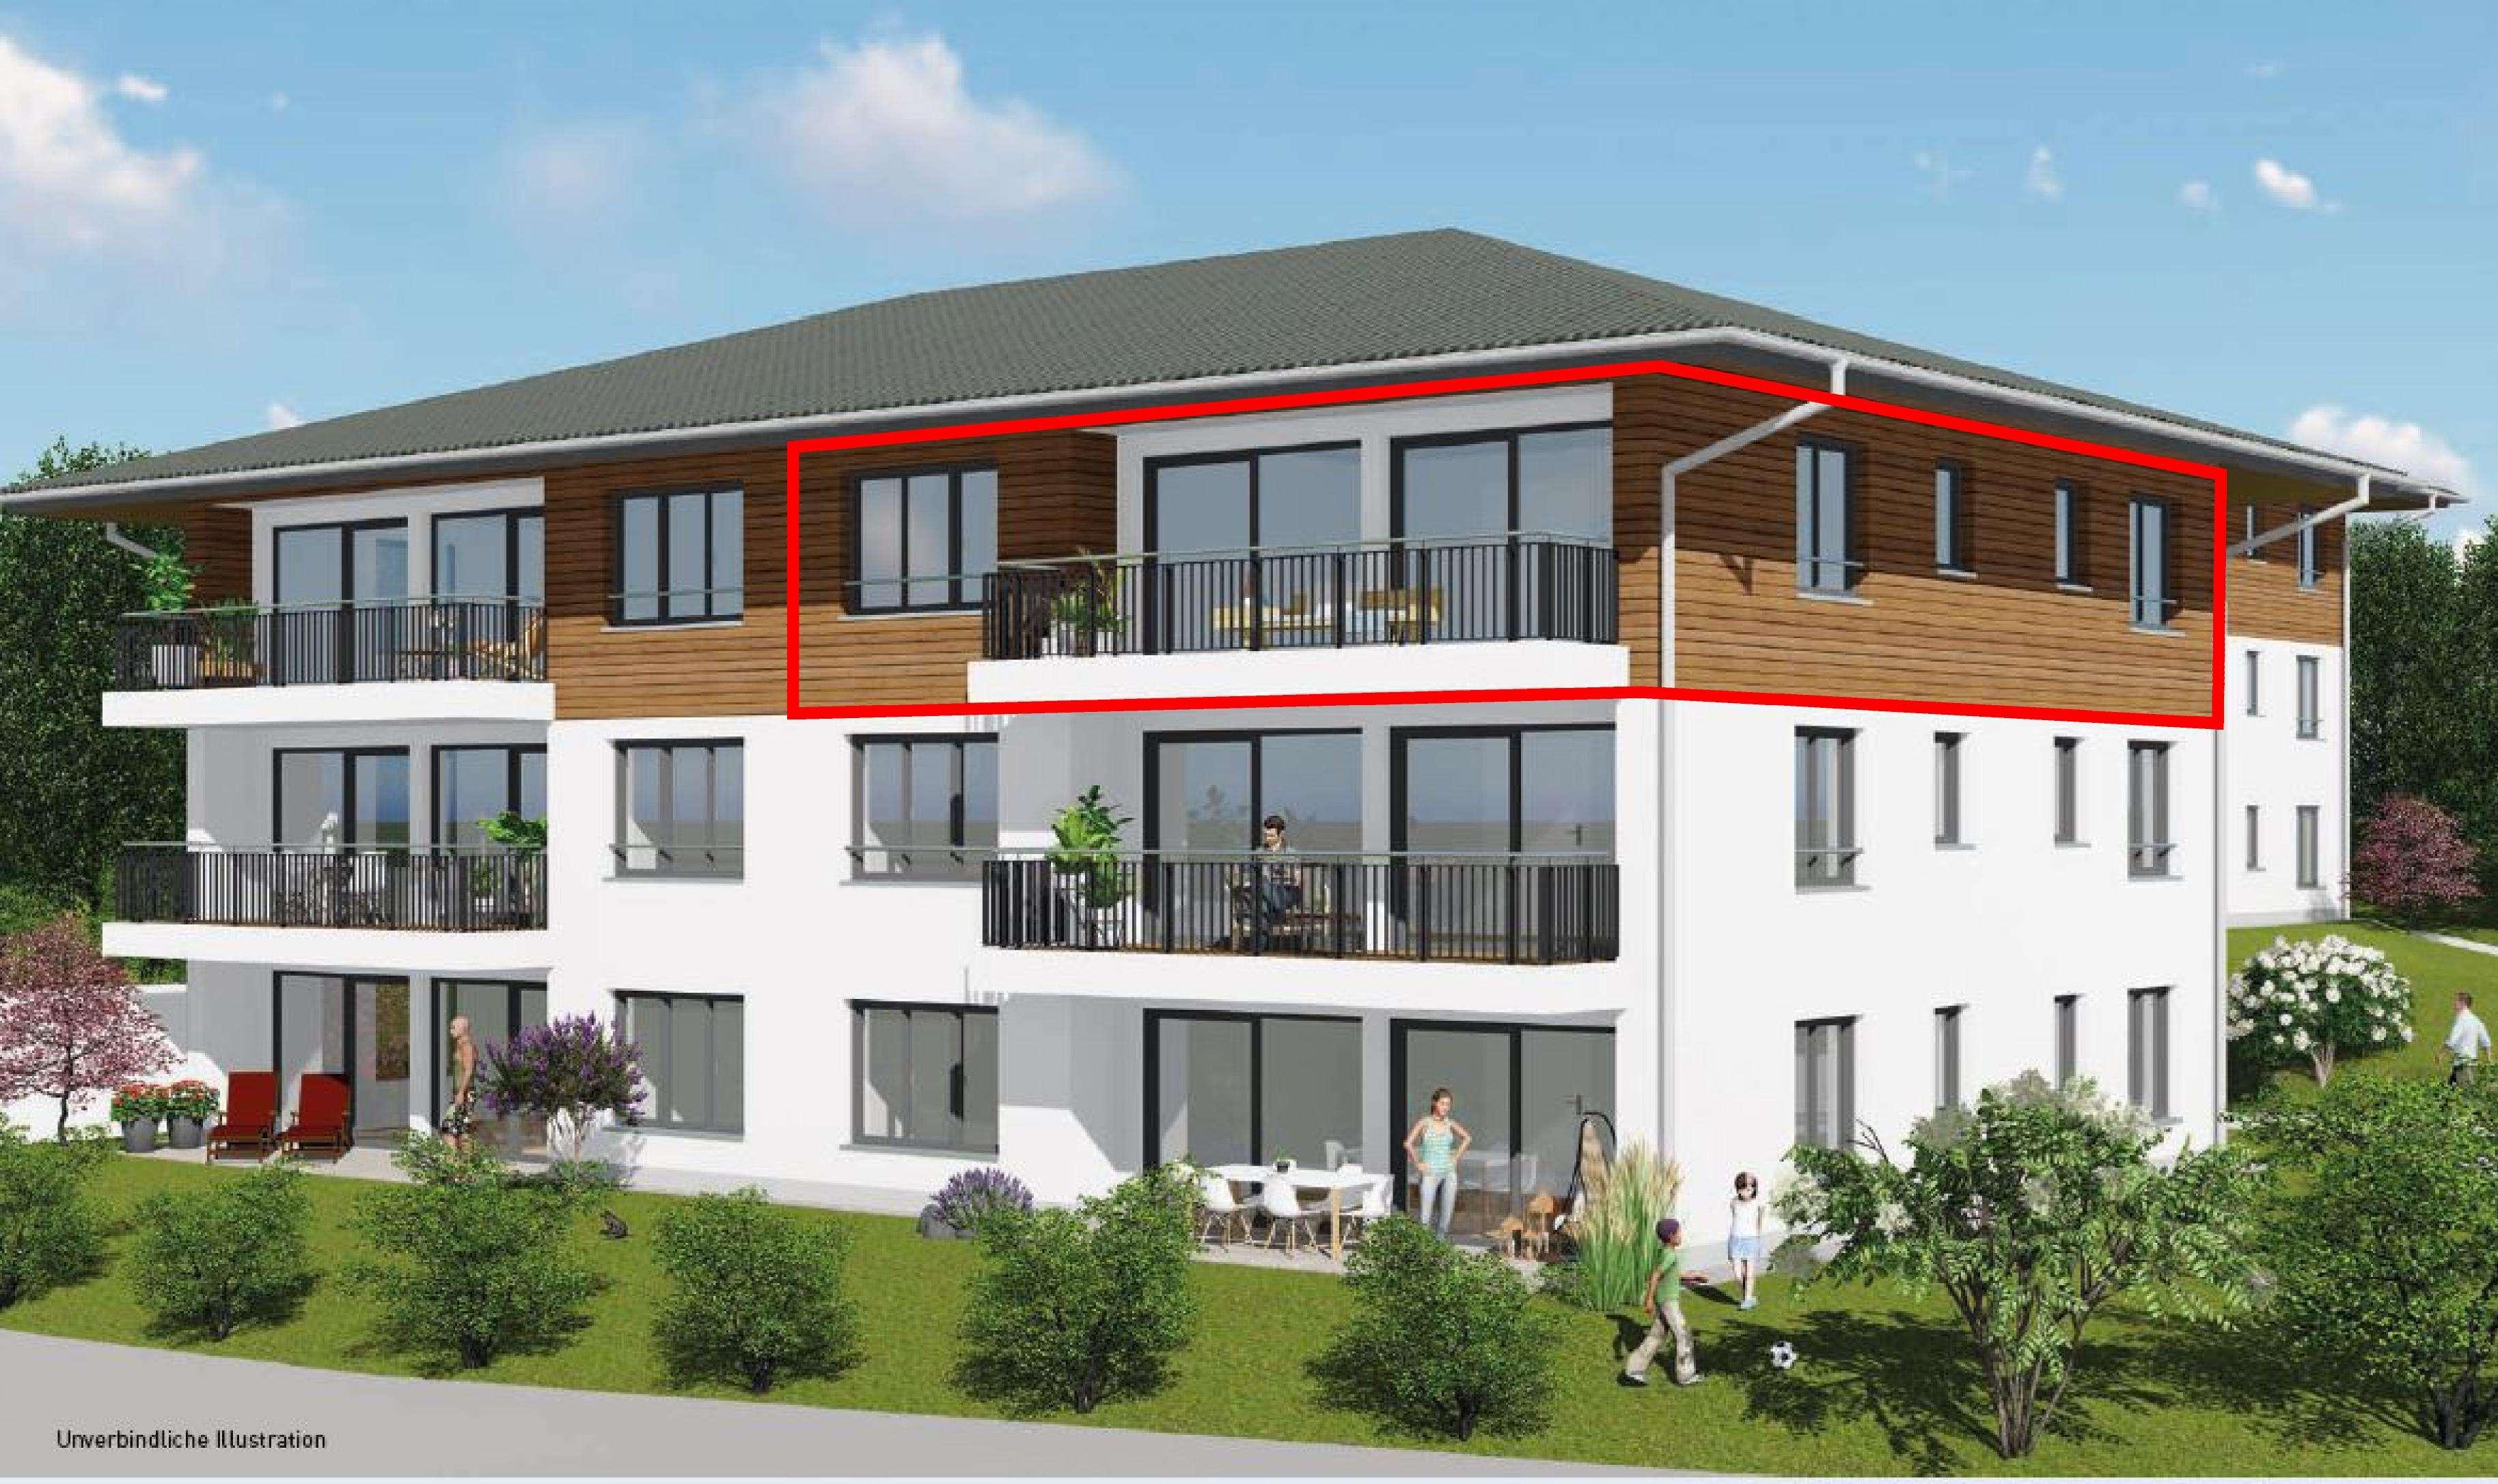 Traum- Neubauwohnung mit unverbaubarem Bergblick in Haldenwang in Haldenwang (Oberallgäu)